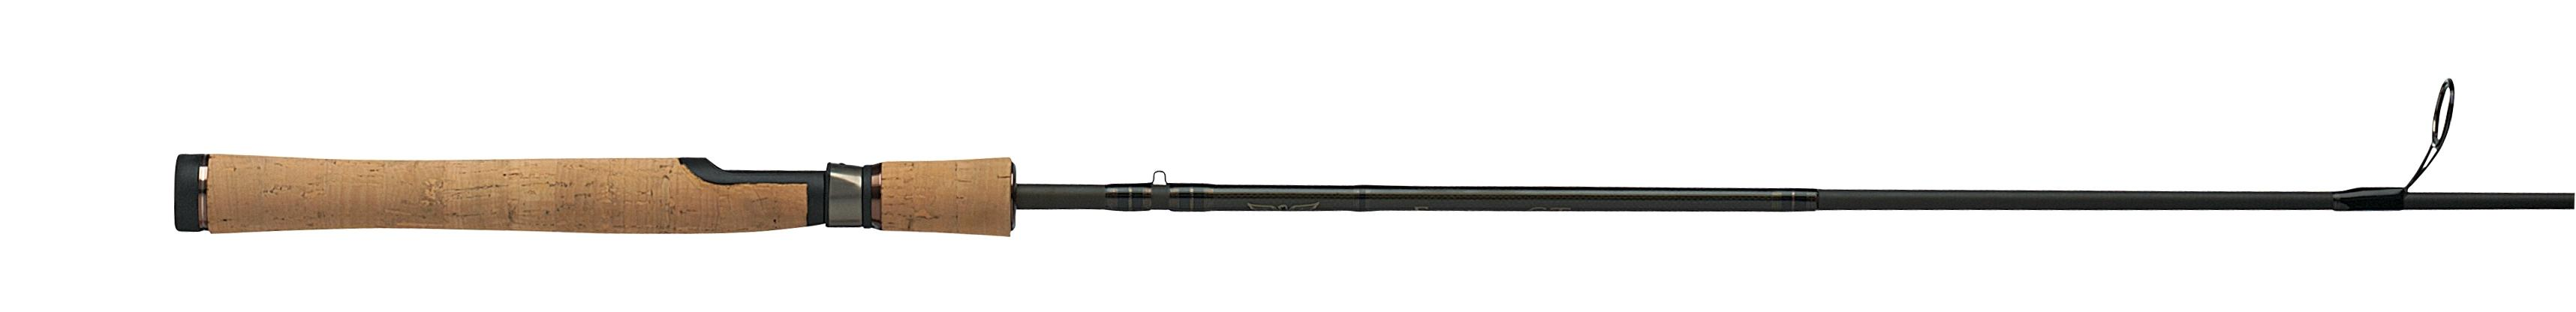 Fenwick Eagle GT 2-piece Spinning Fishing Rod - Thumbnail 2